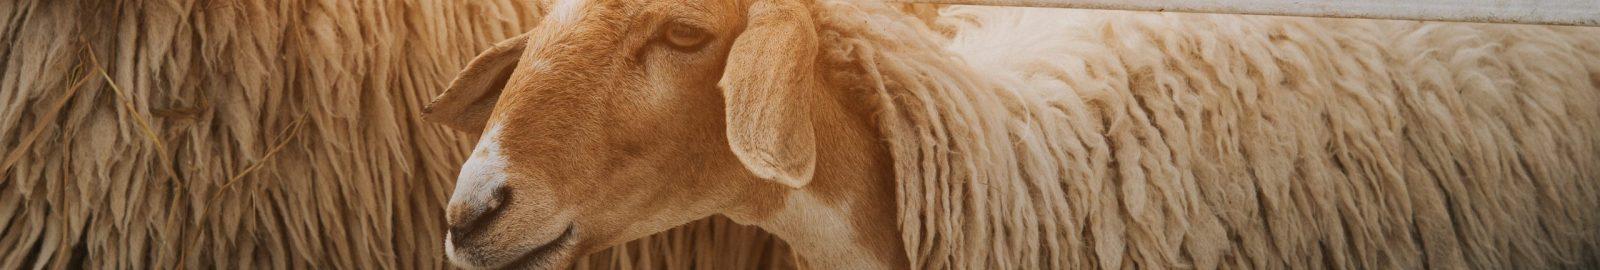 banniere_mouton